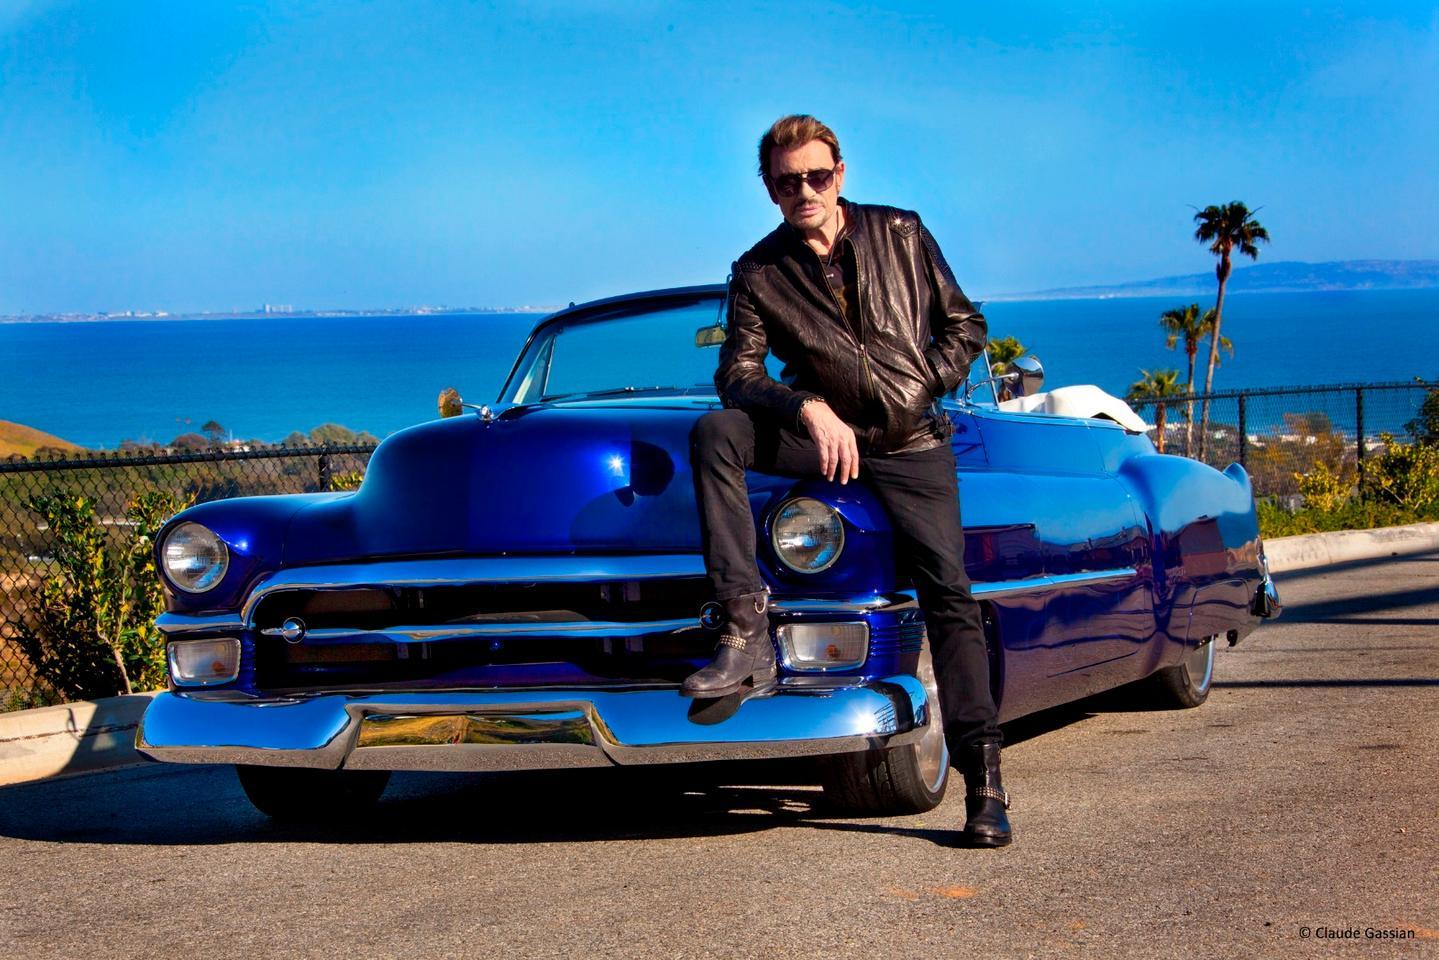 Hallyday and his Cadillac